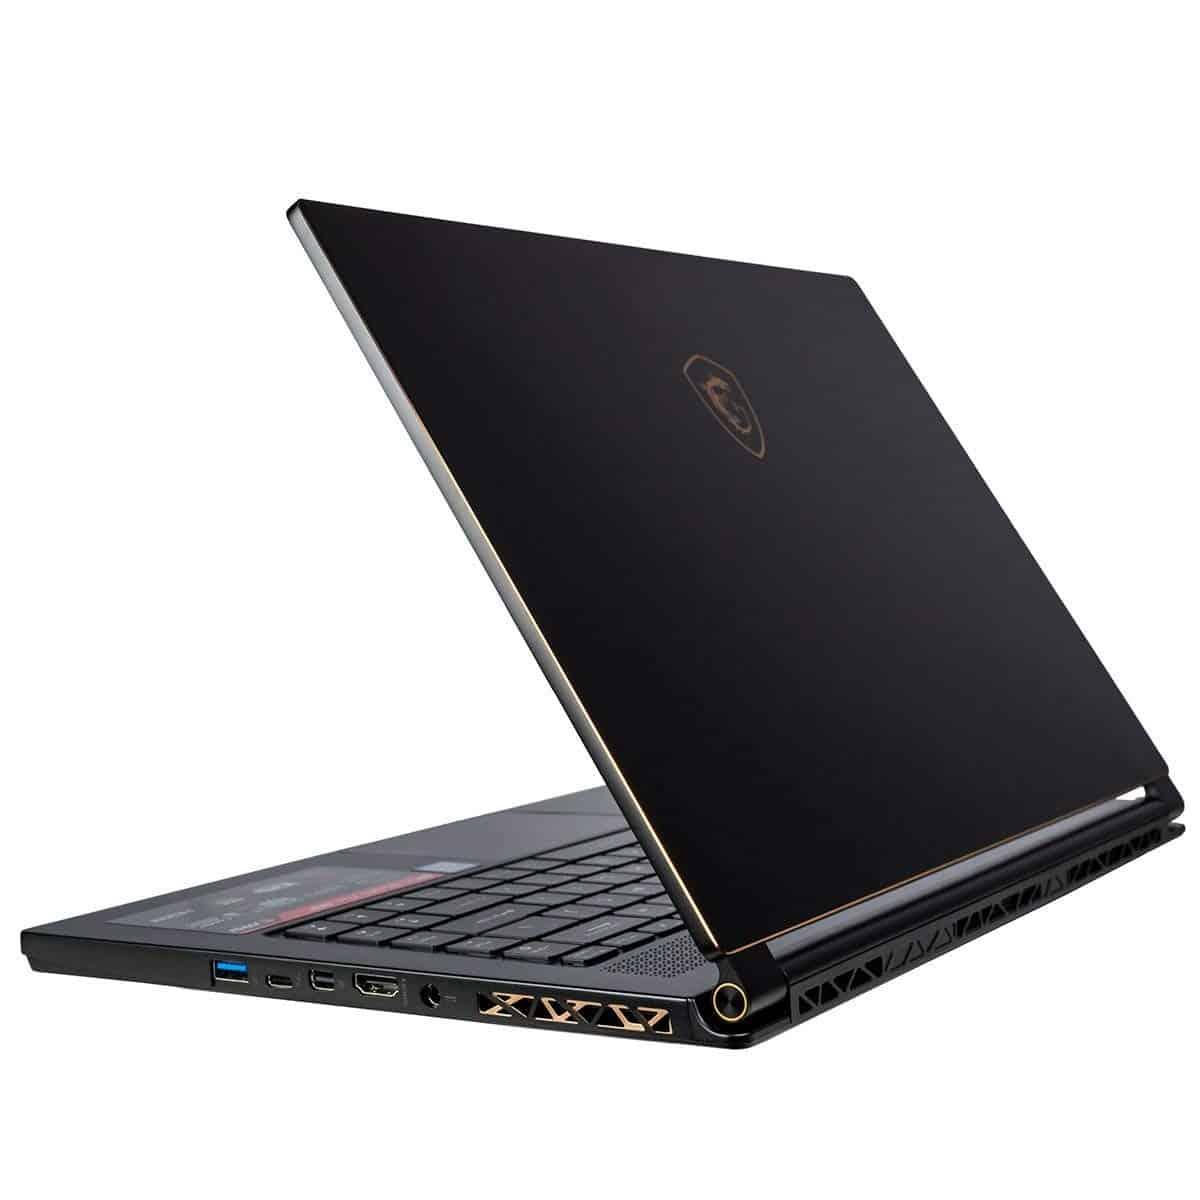 لپ تاپ گیمینگ MSI-۲